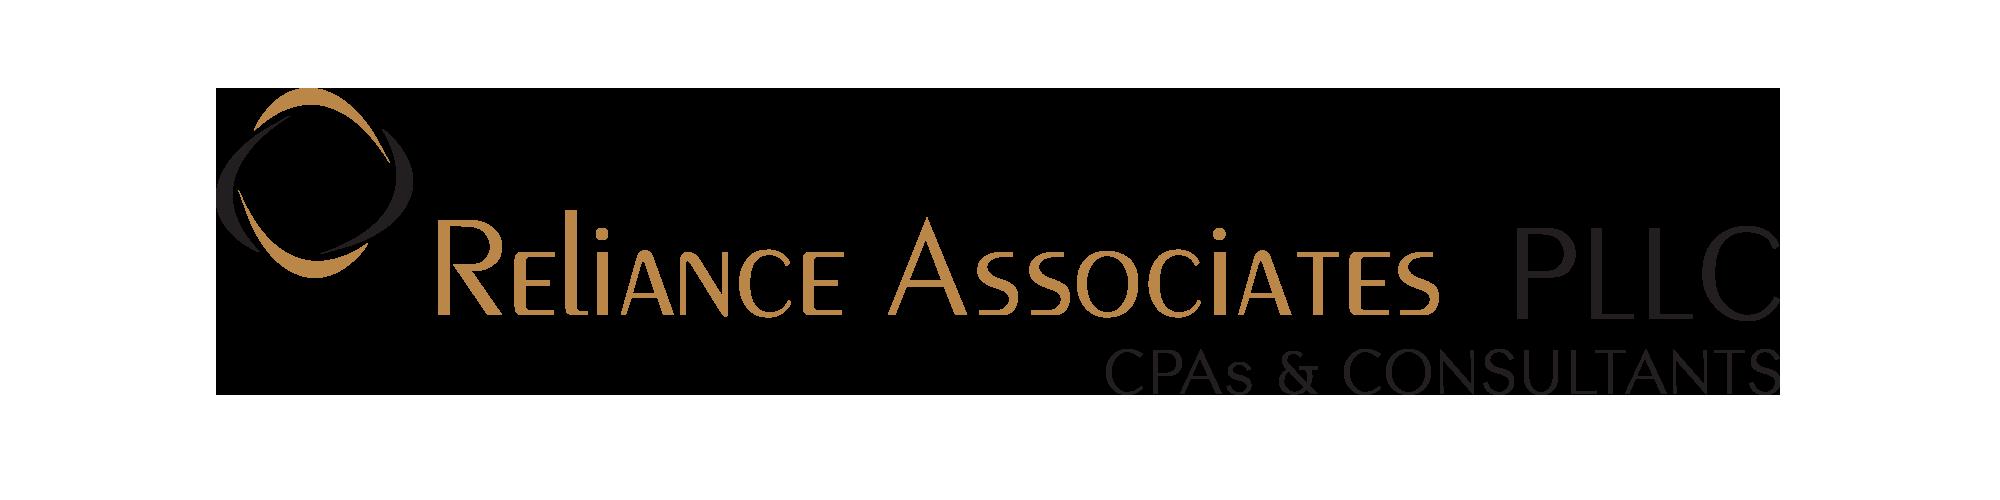 Reliance Associates, PLLC